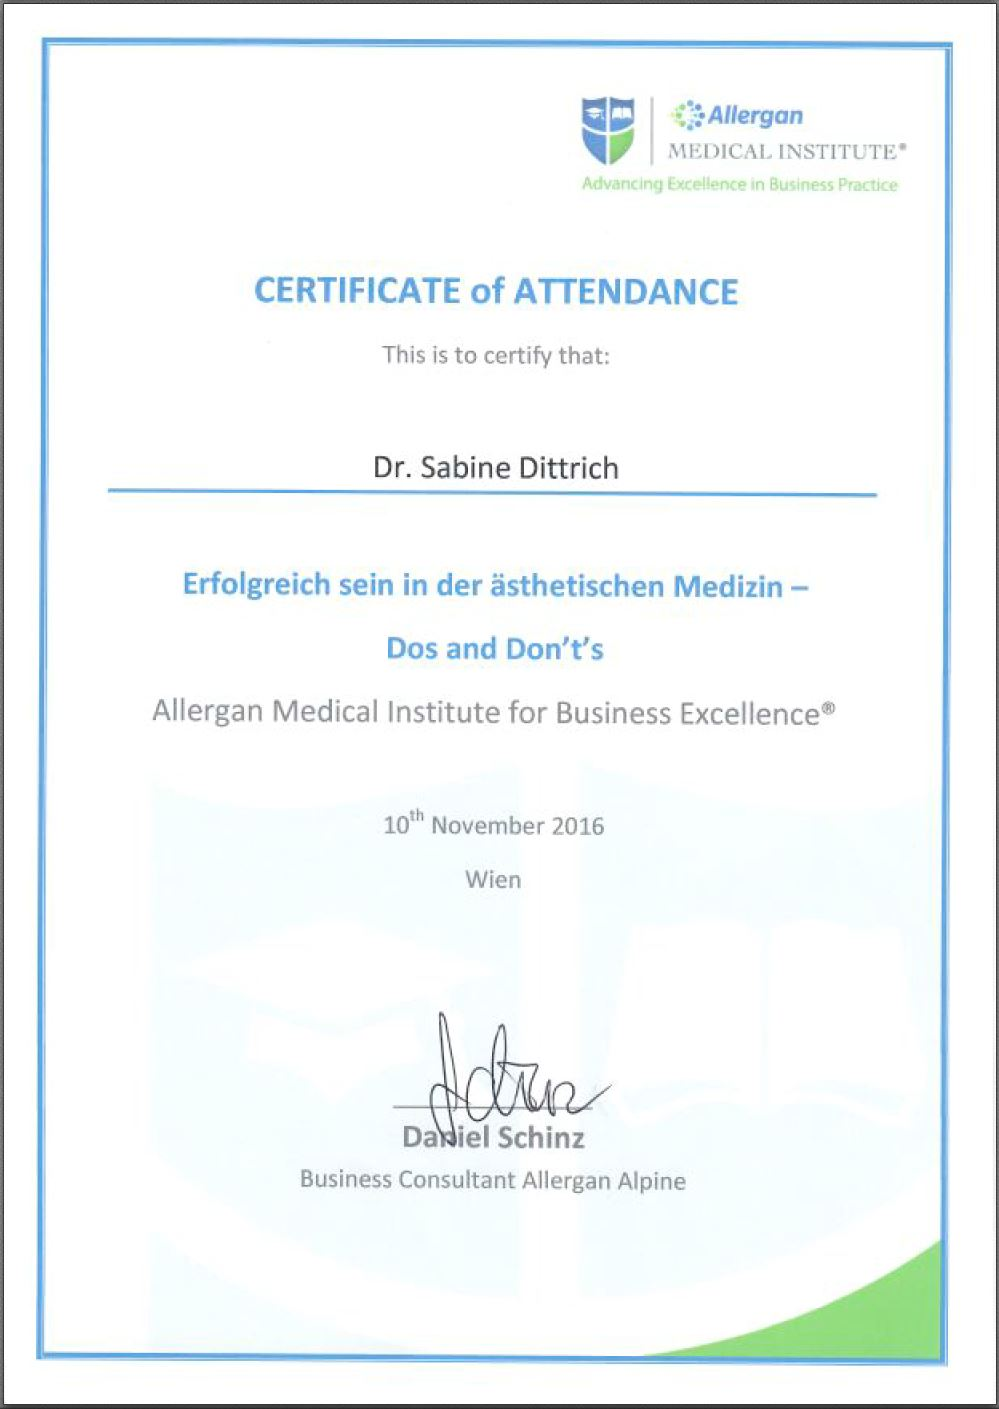 Diplom Ästhetische Medizin - dos and don'ts